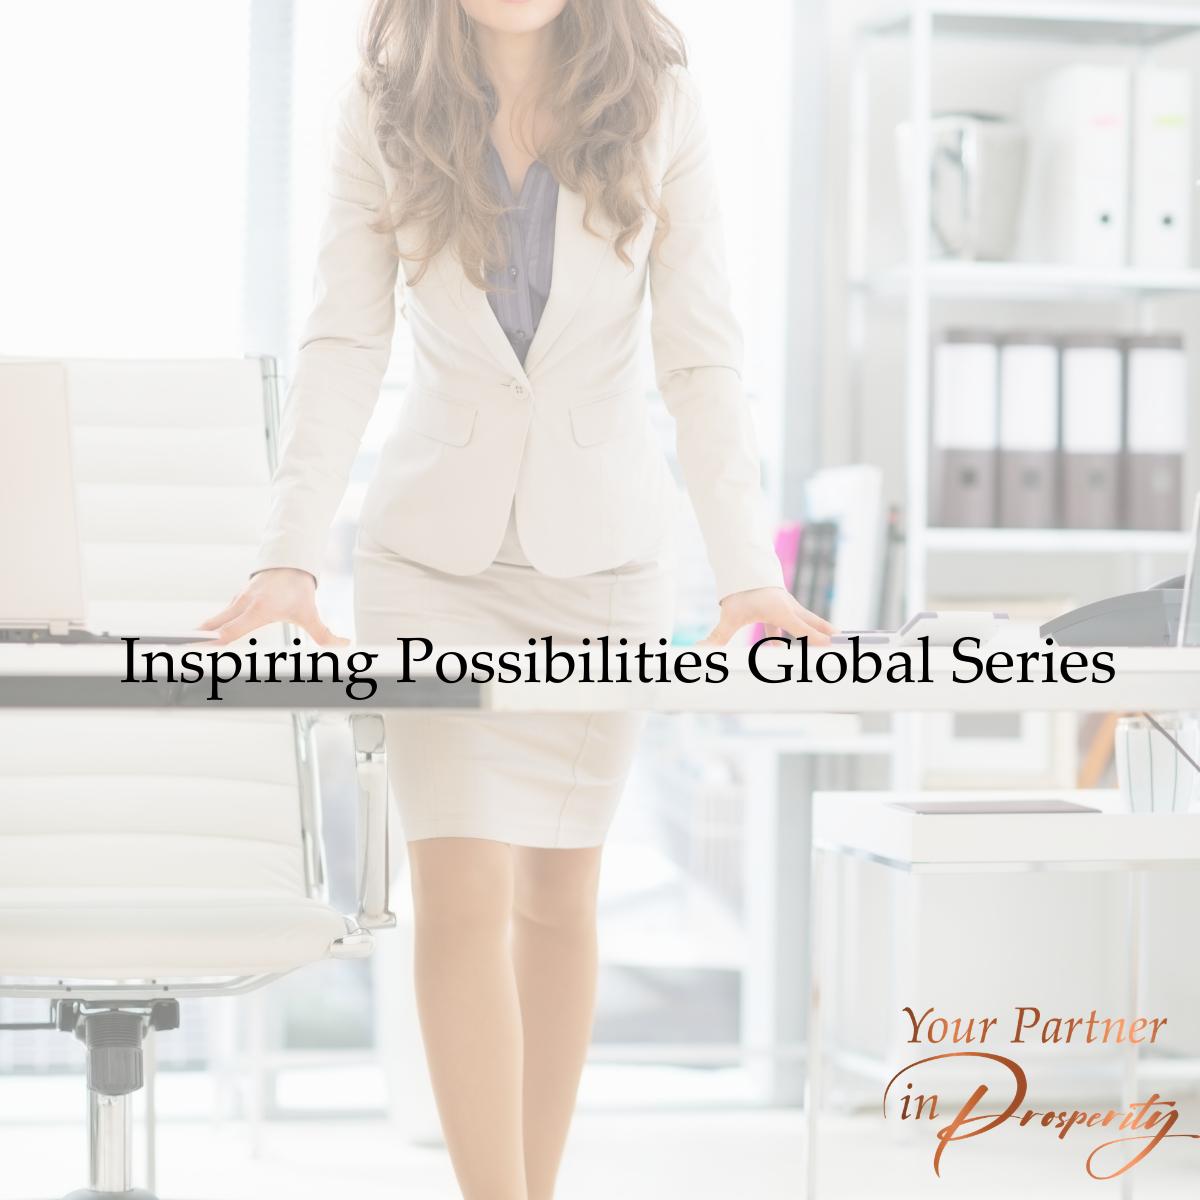 Inspiring Possibilities Global Series